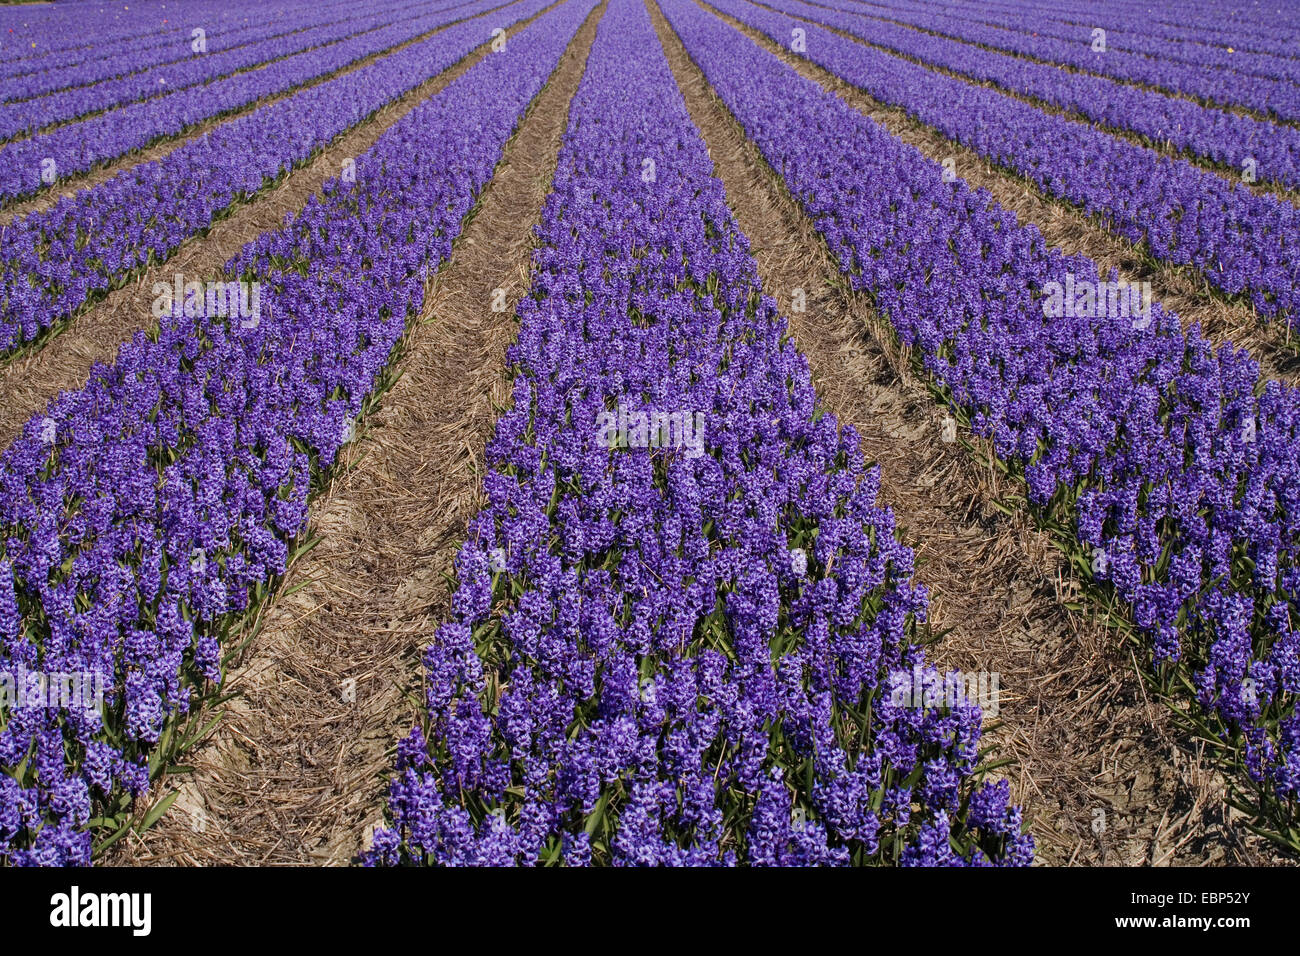 Jacinthe (Hyacinthus orientalis), Field of hyacinths at Keukenhof, Netherlands, Lisse Stock Photo